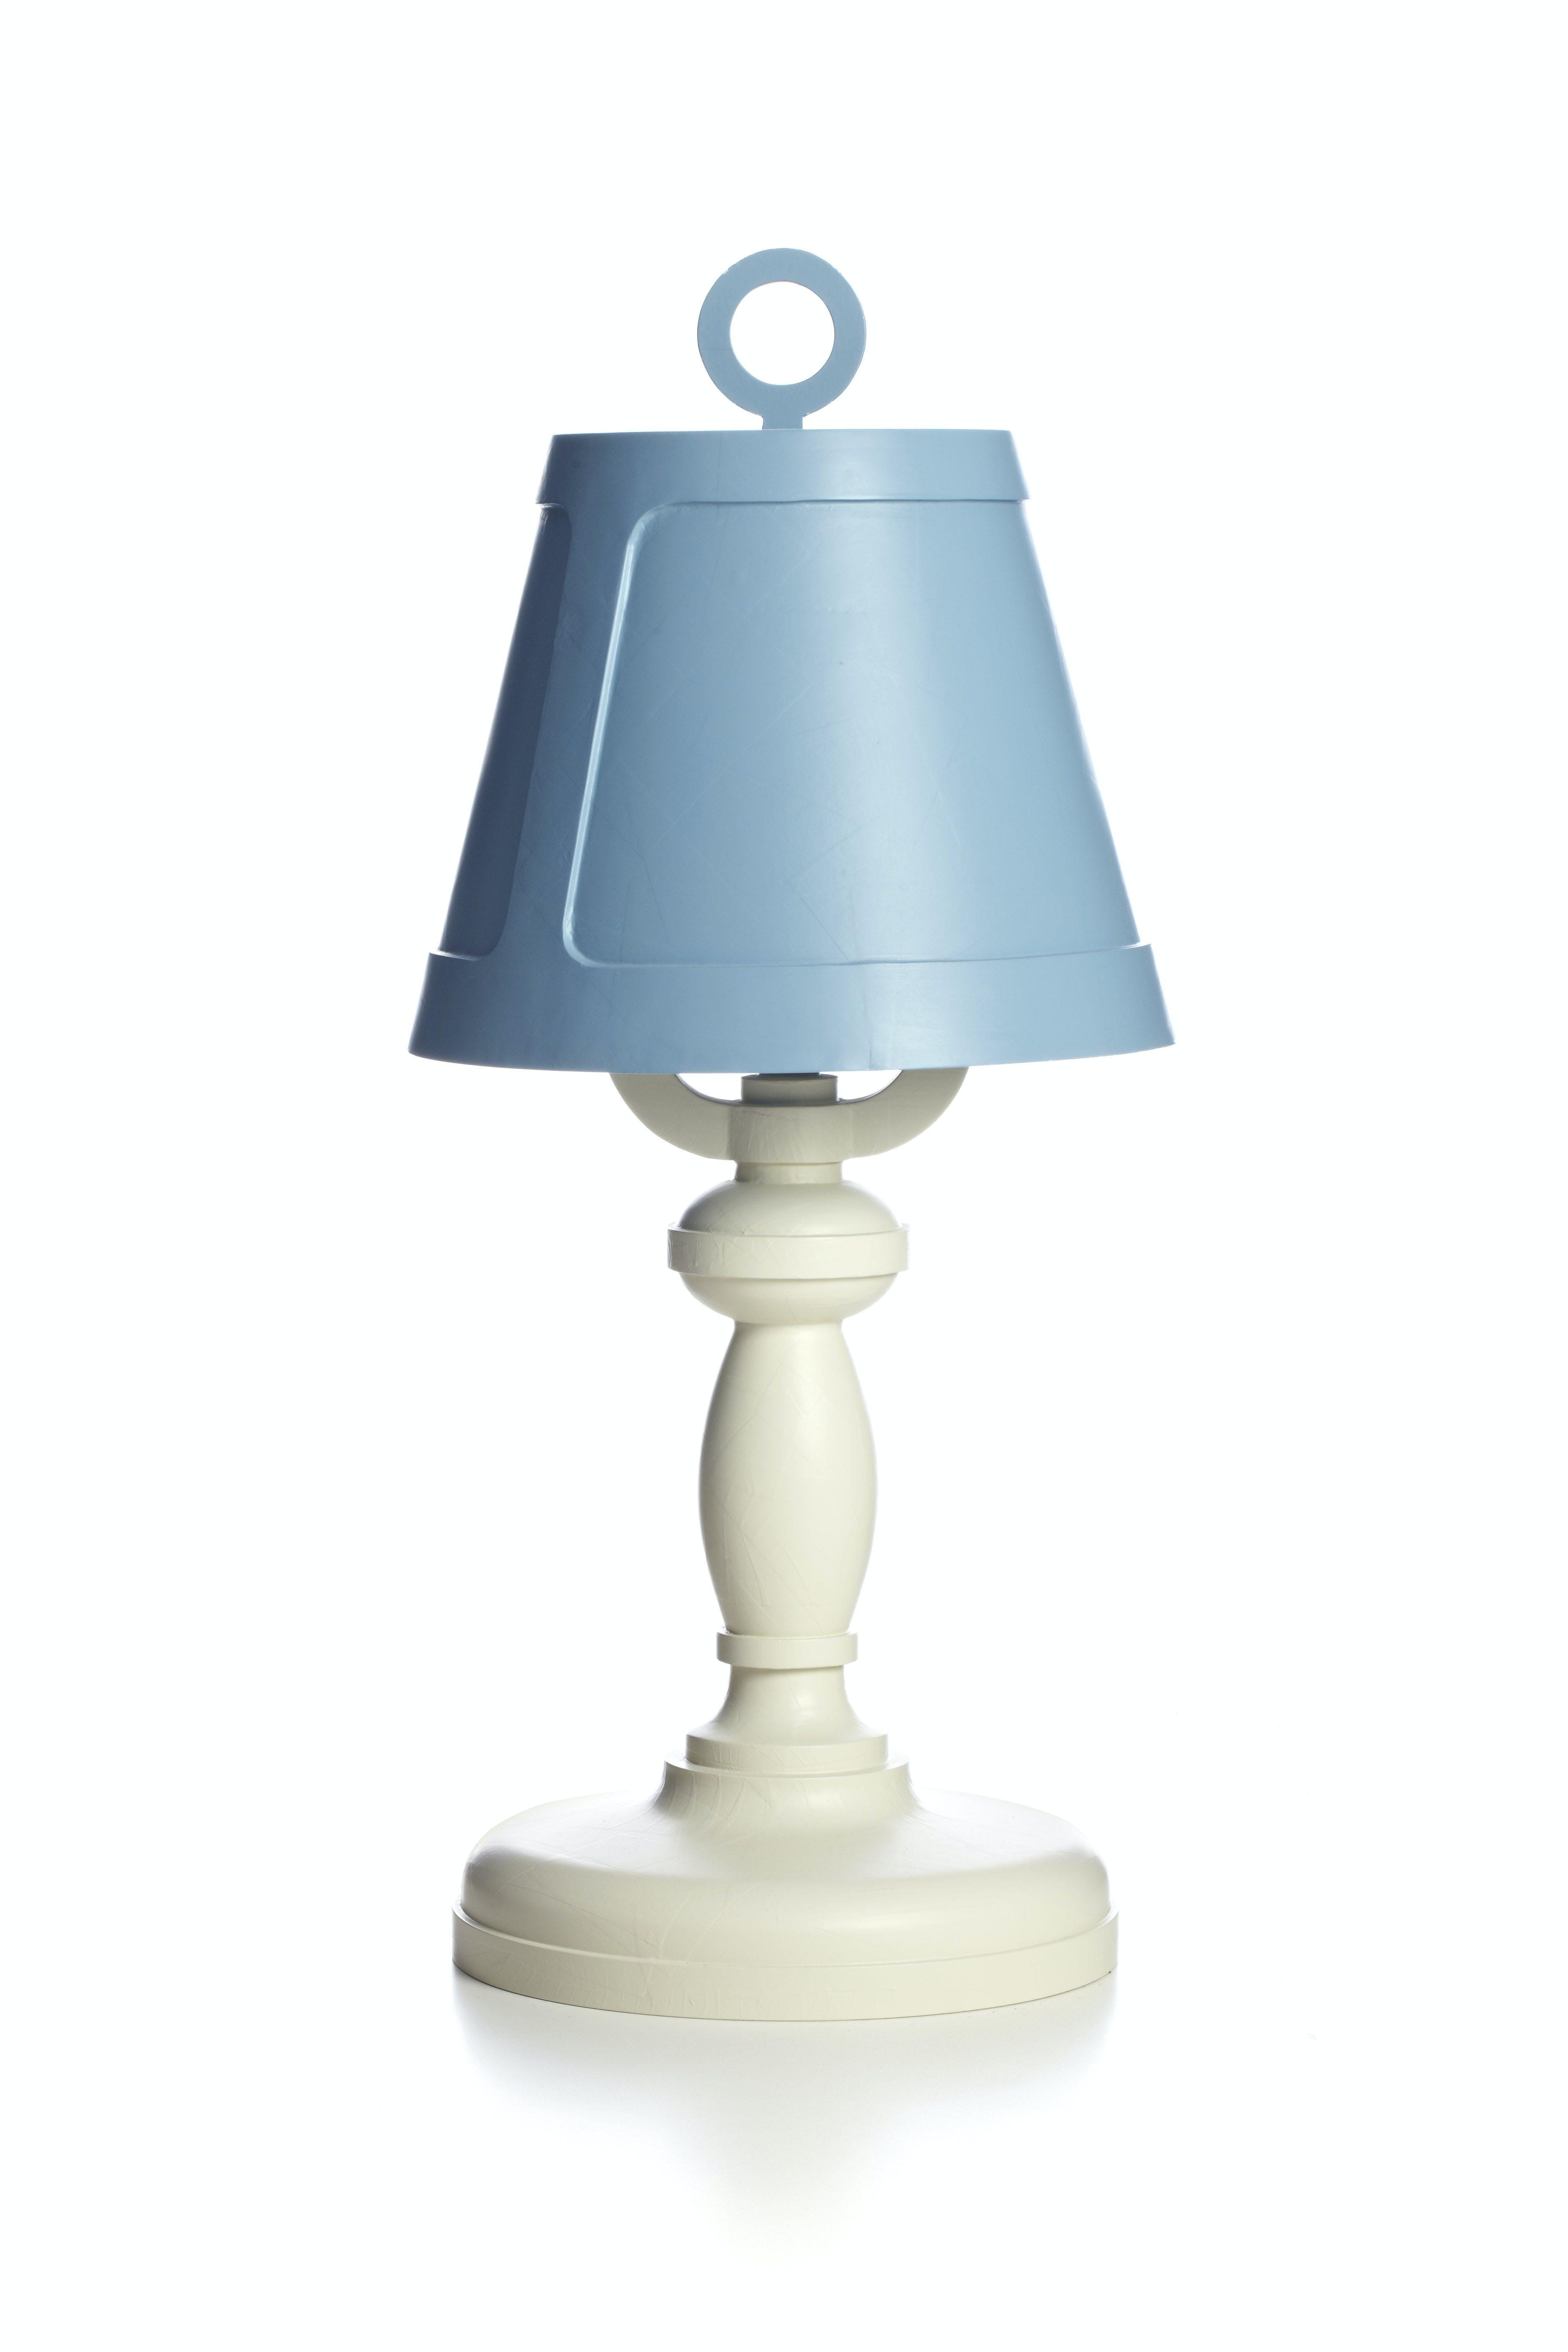 Papertablelamp Patch1